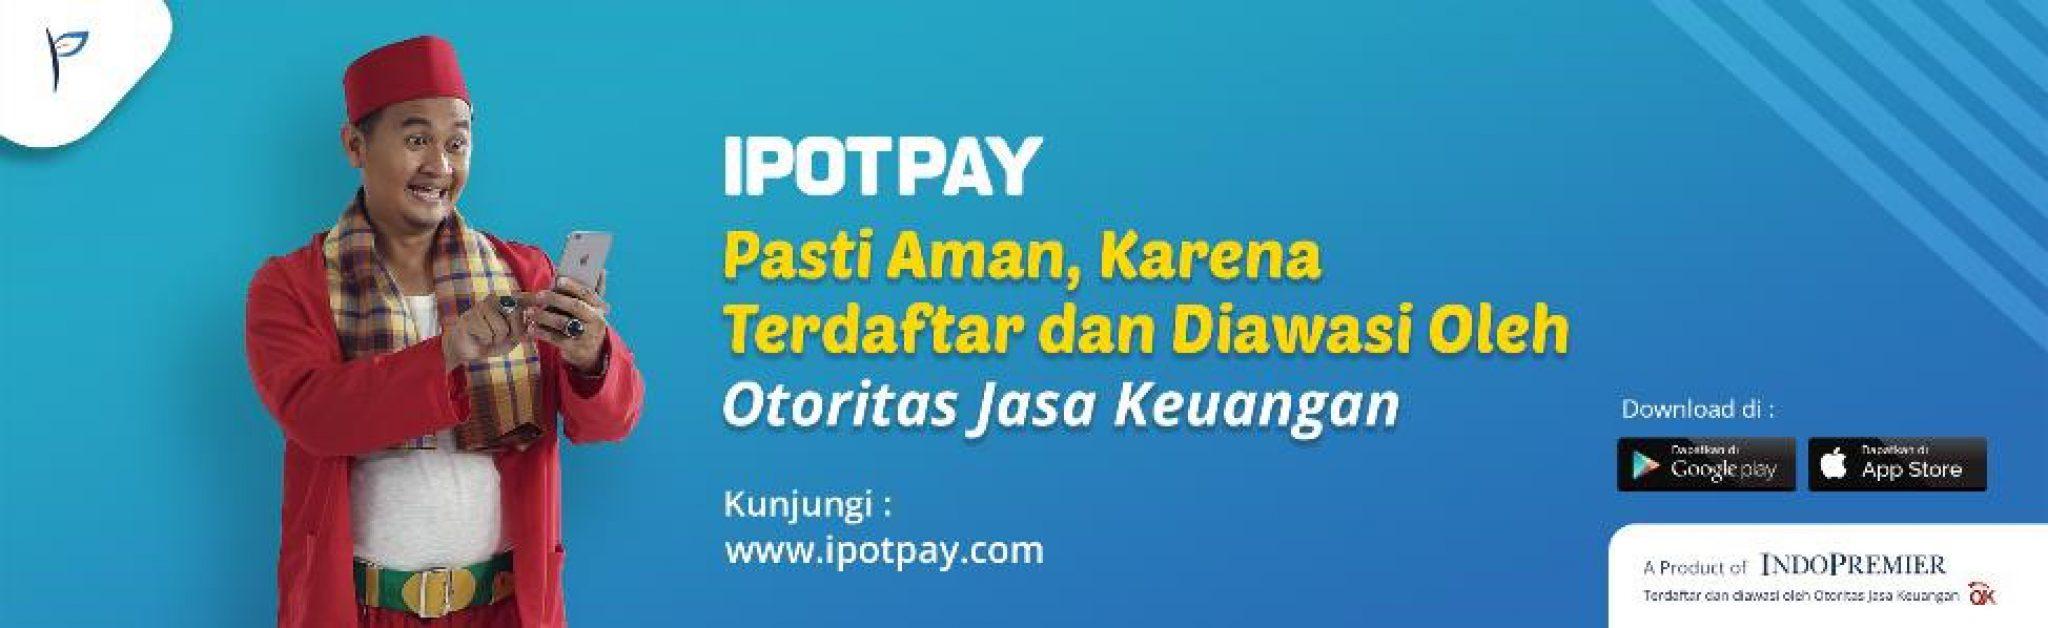 IPOTPAY-CekAja